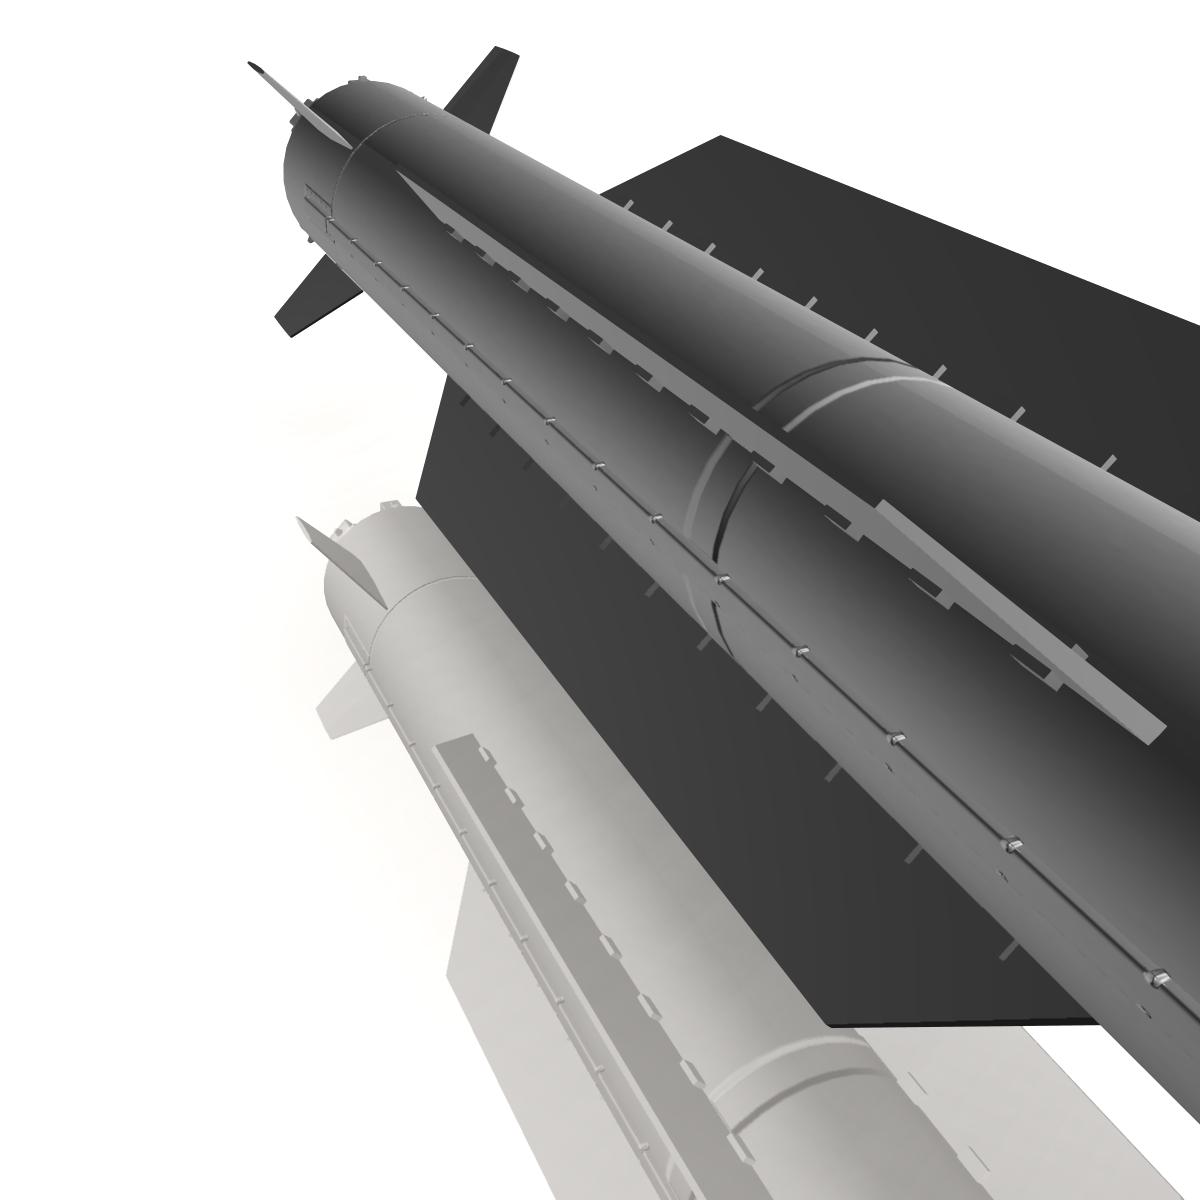 БНХАУ-ын С-400 пуужин 3d загвар 3ds dxf cob x obj 157974